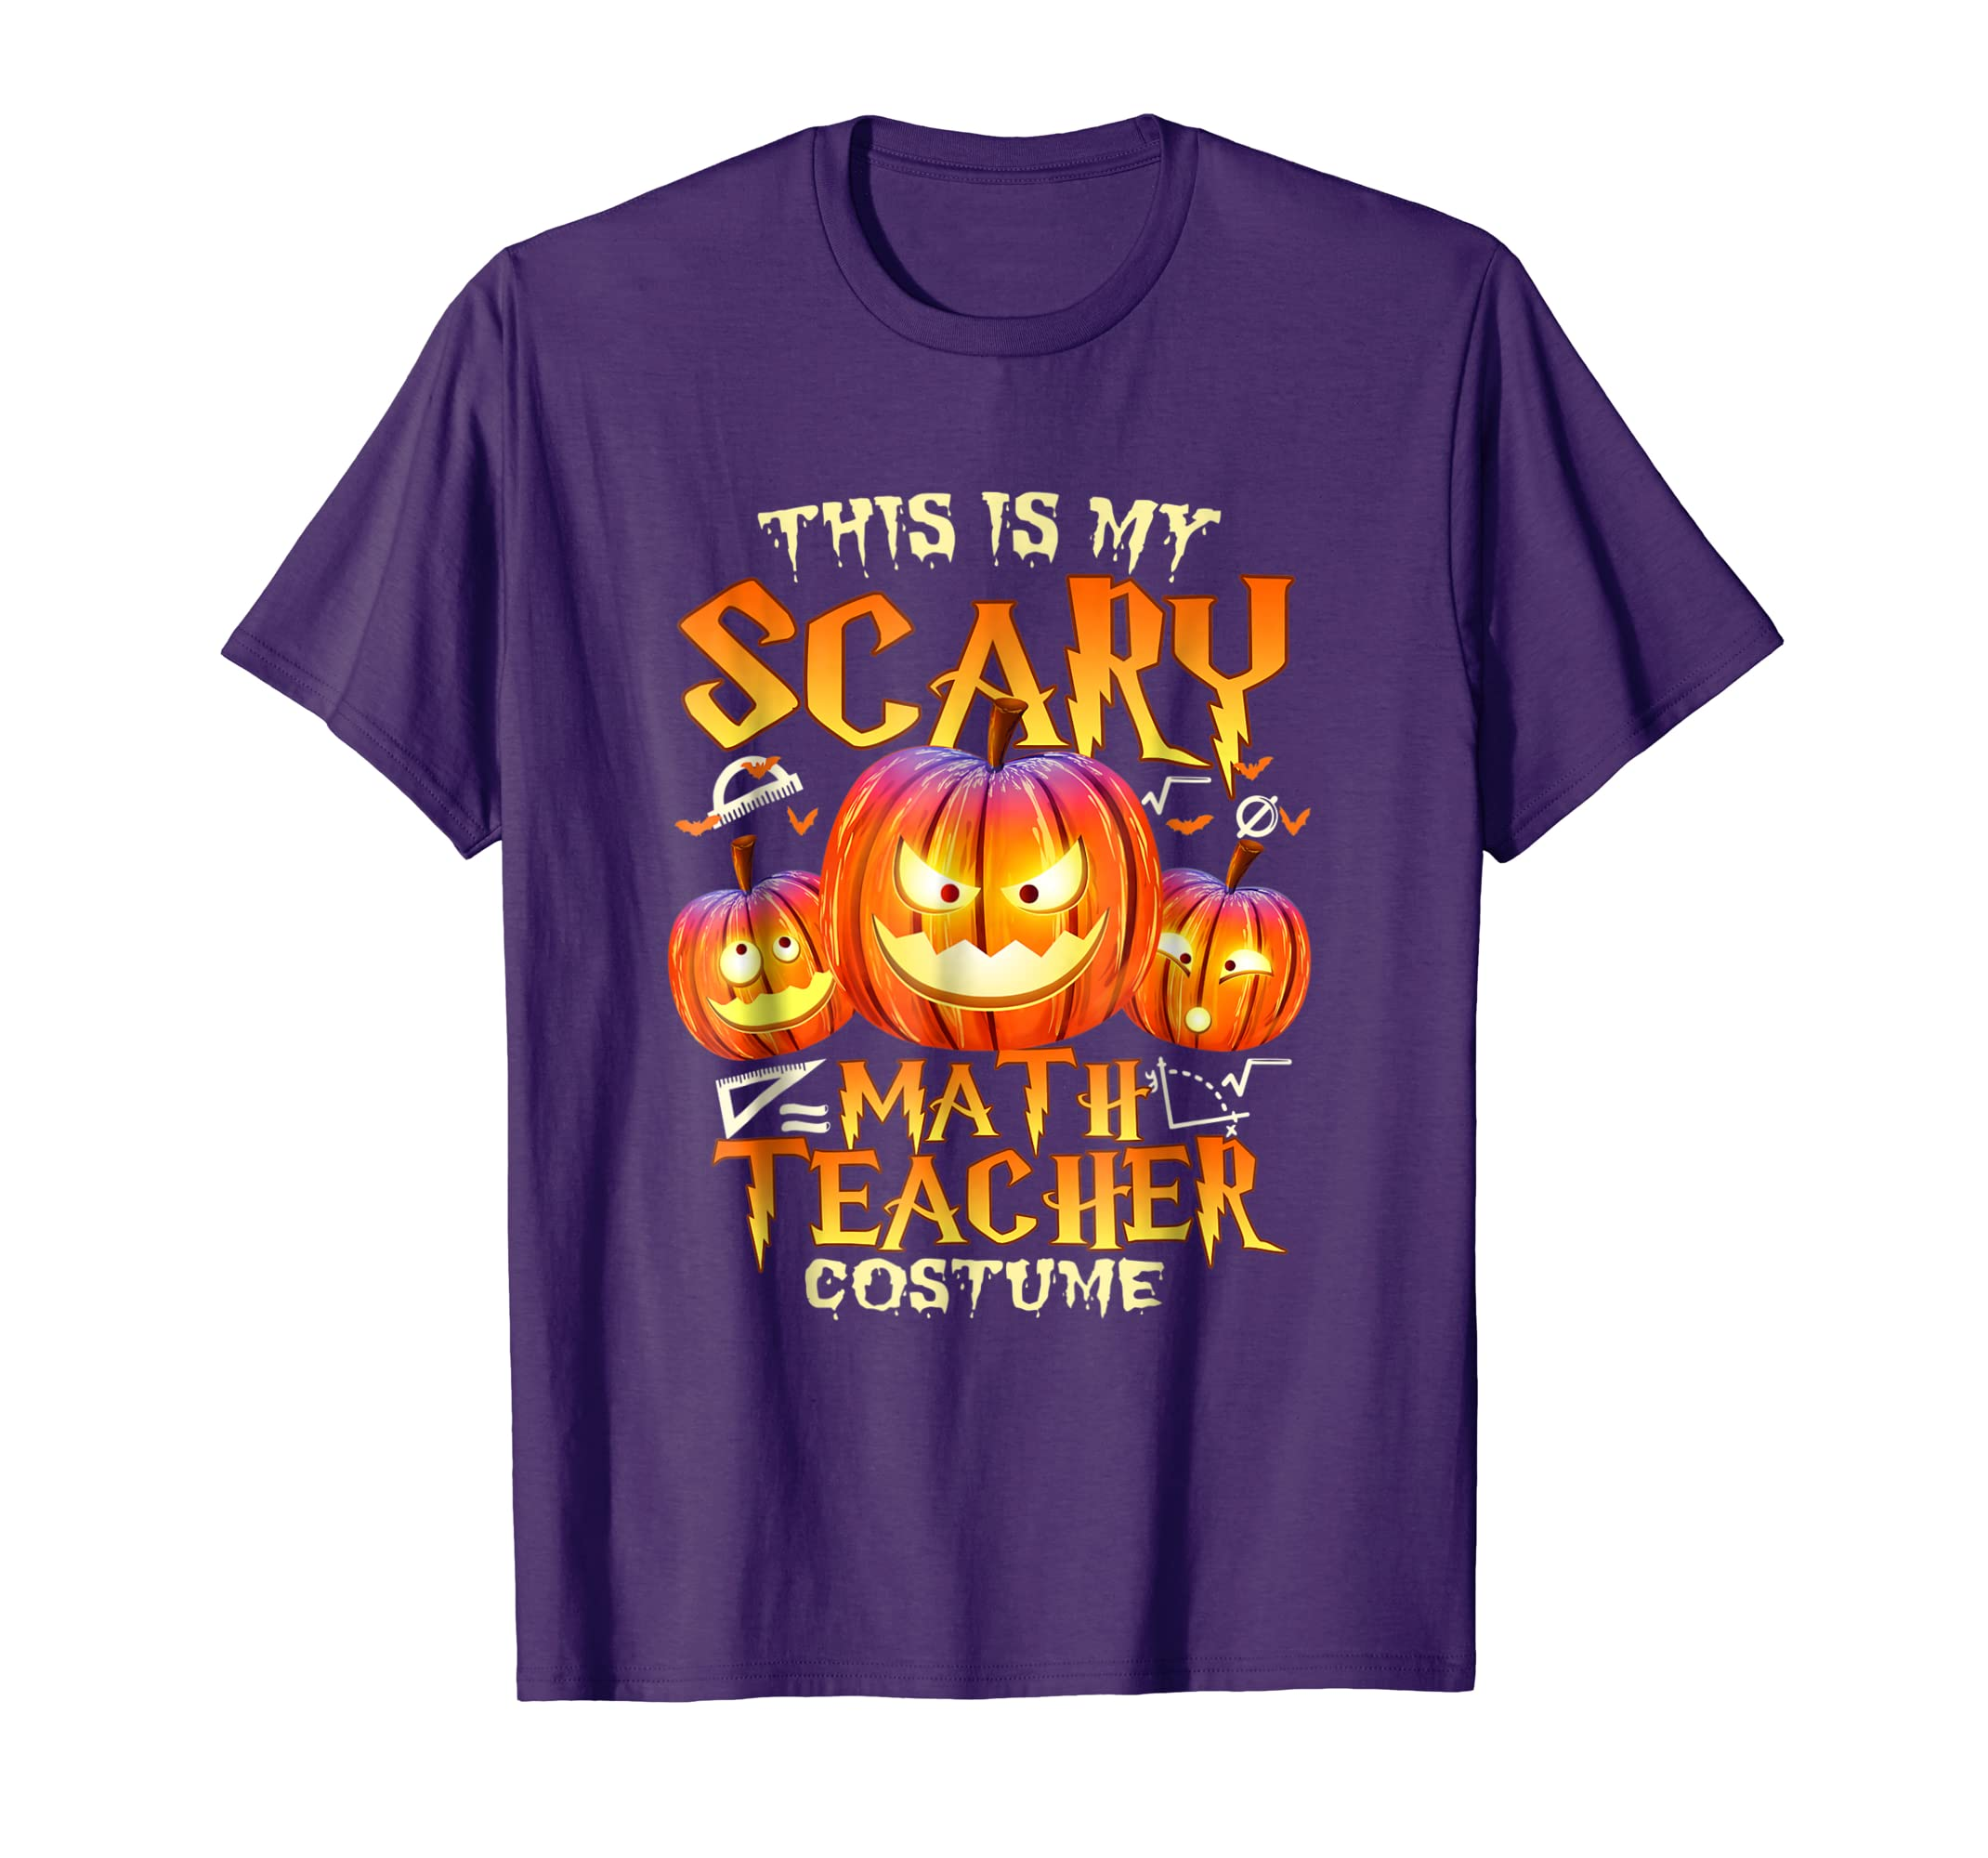 This Is My Scary Math Teacher Costume Halloween T Shirt-Teechatpro